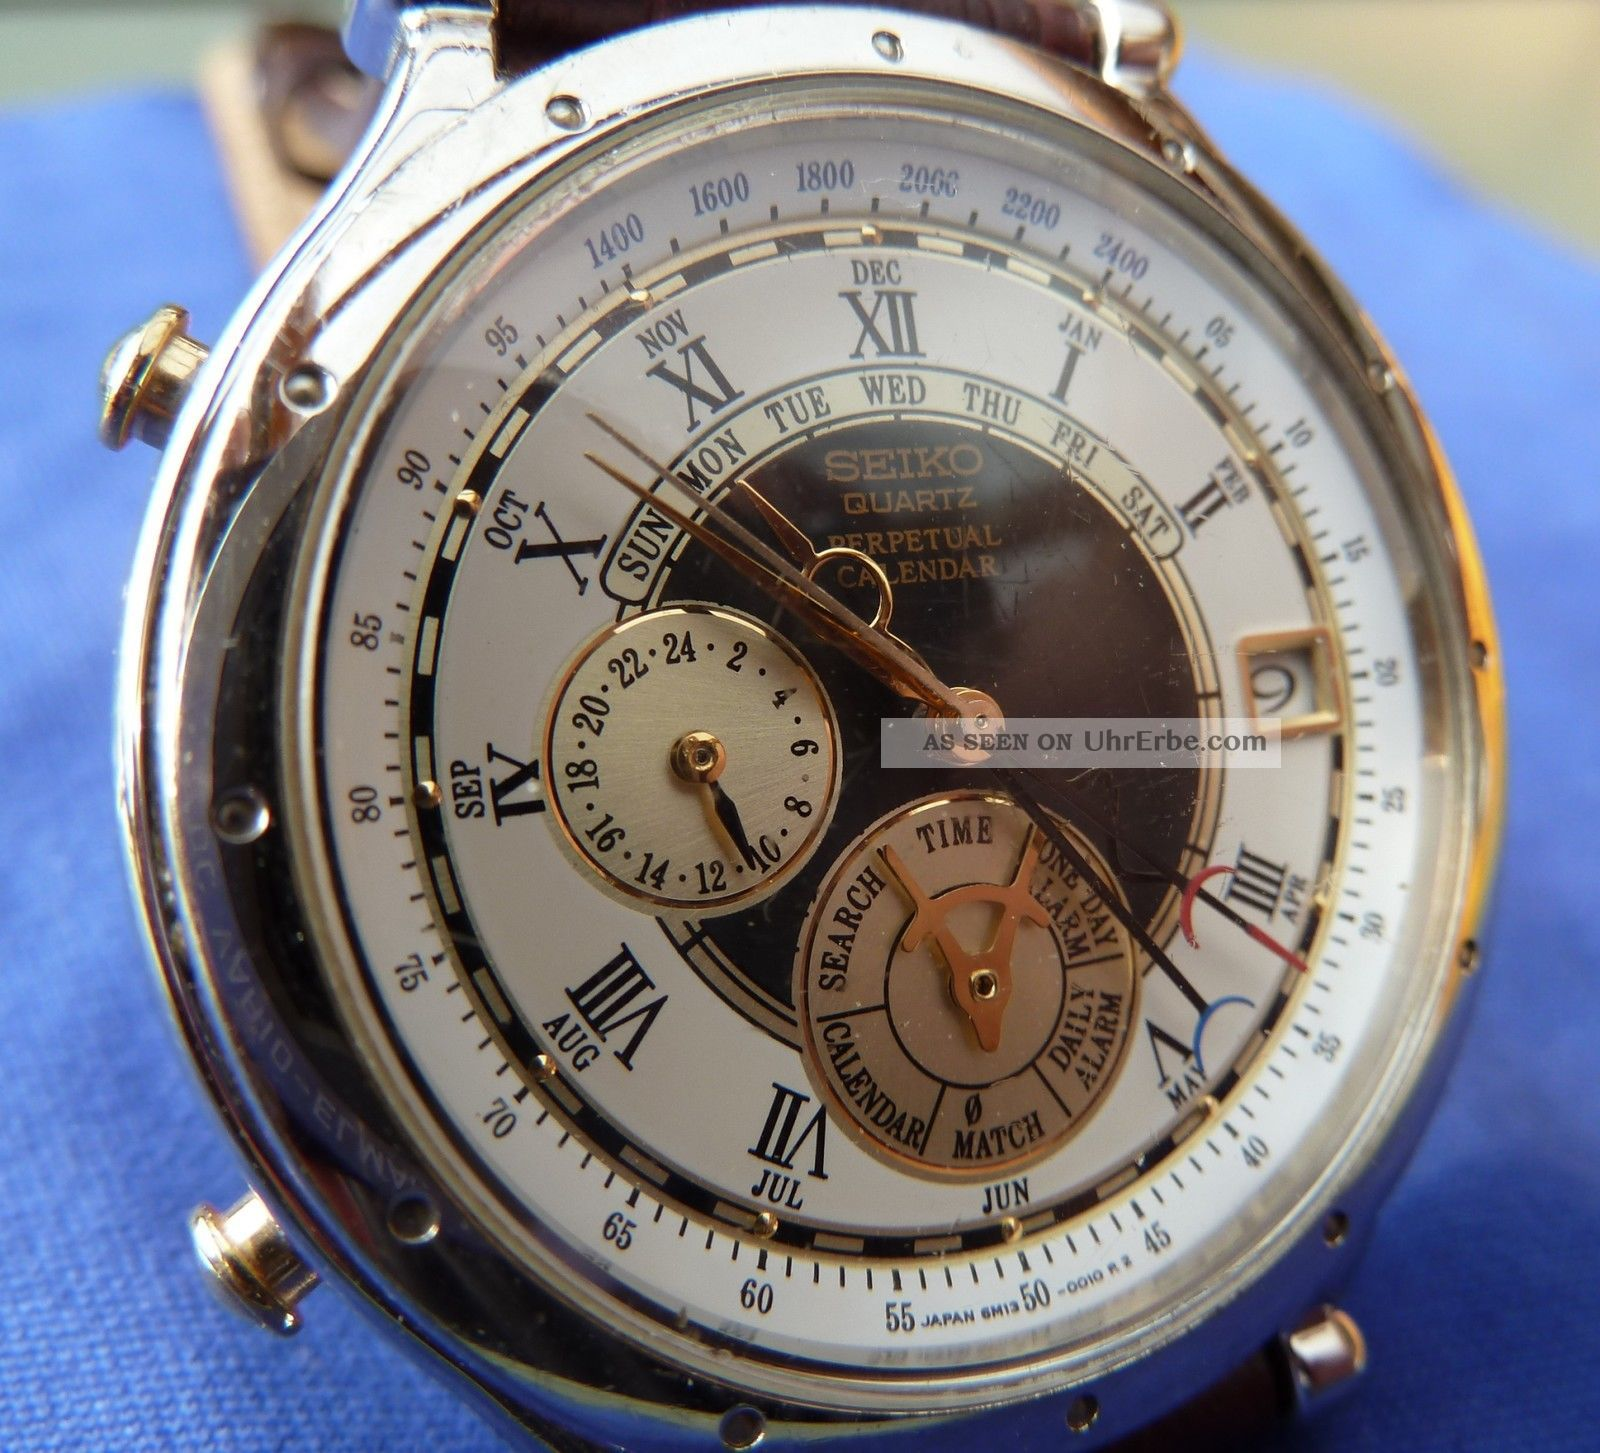 Seiko Perpetual Calendar Vintage : Seiko m perpetual calendar age of discovery